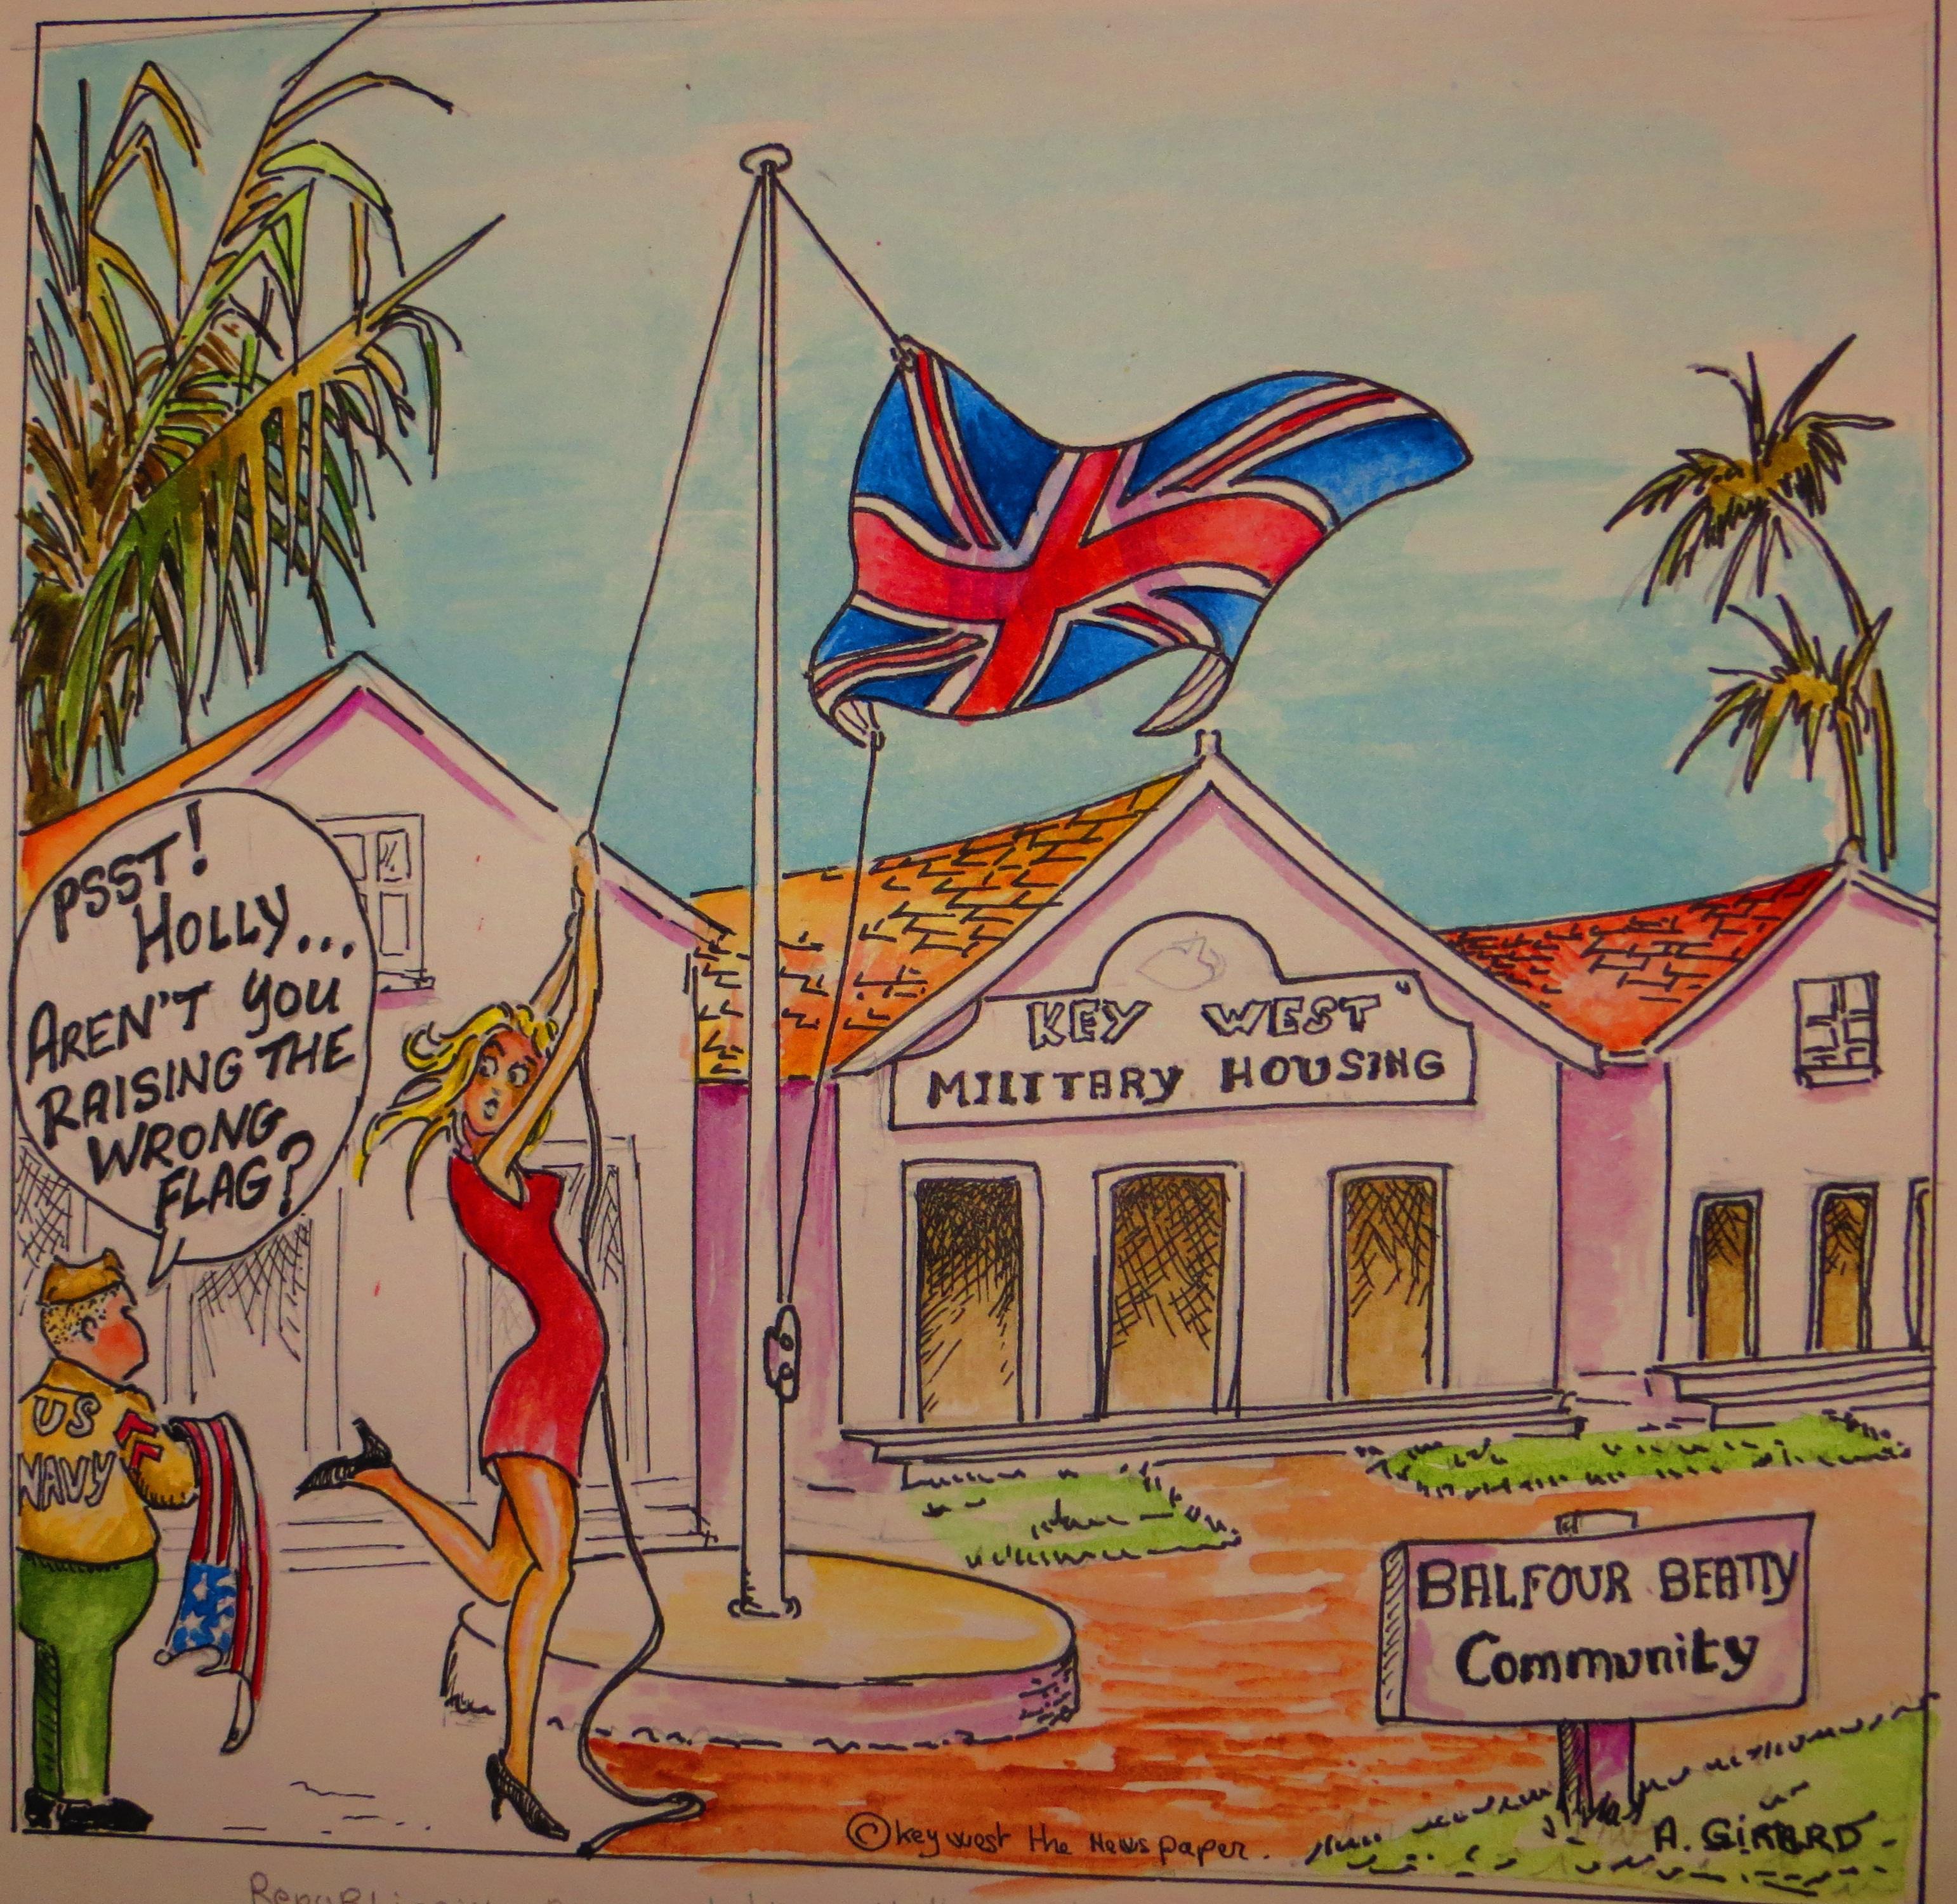 Key West Apartments: FLORIDA KEYS V. PRIVATIZED MILITARY HOUSING INDUSTRY